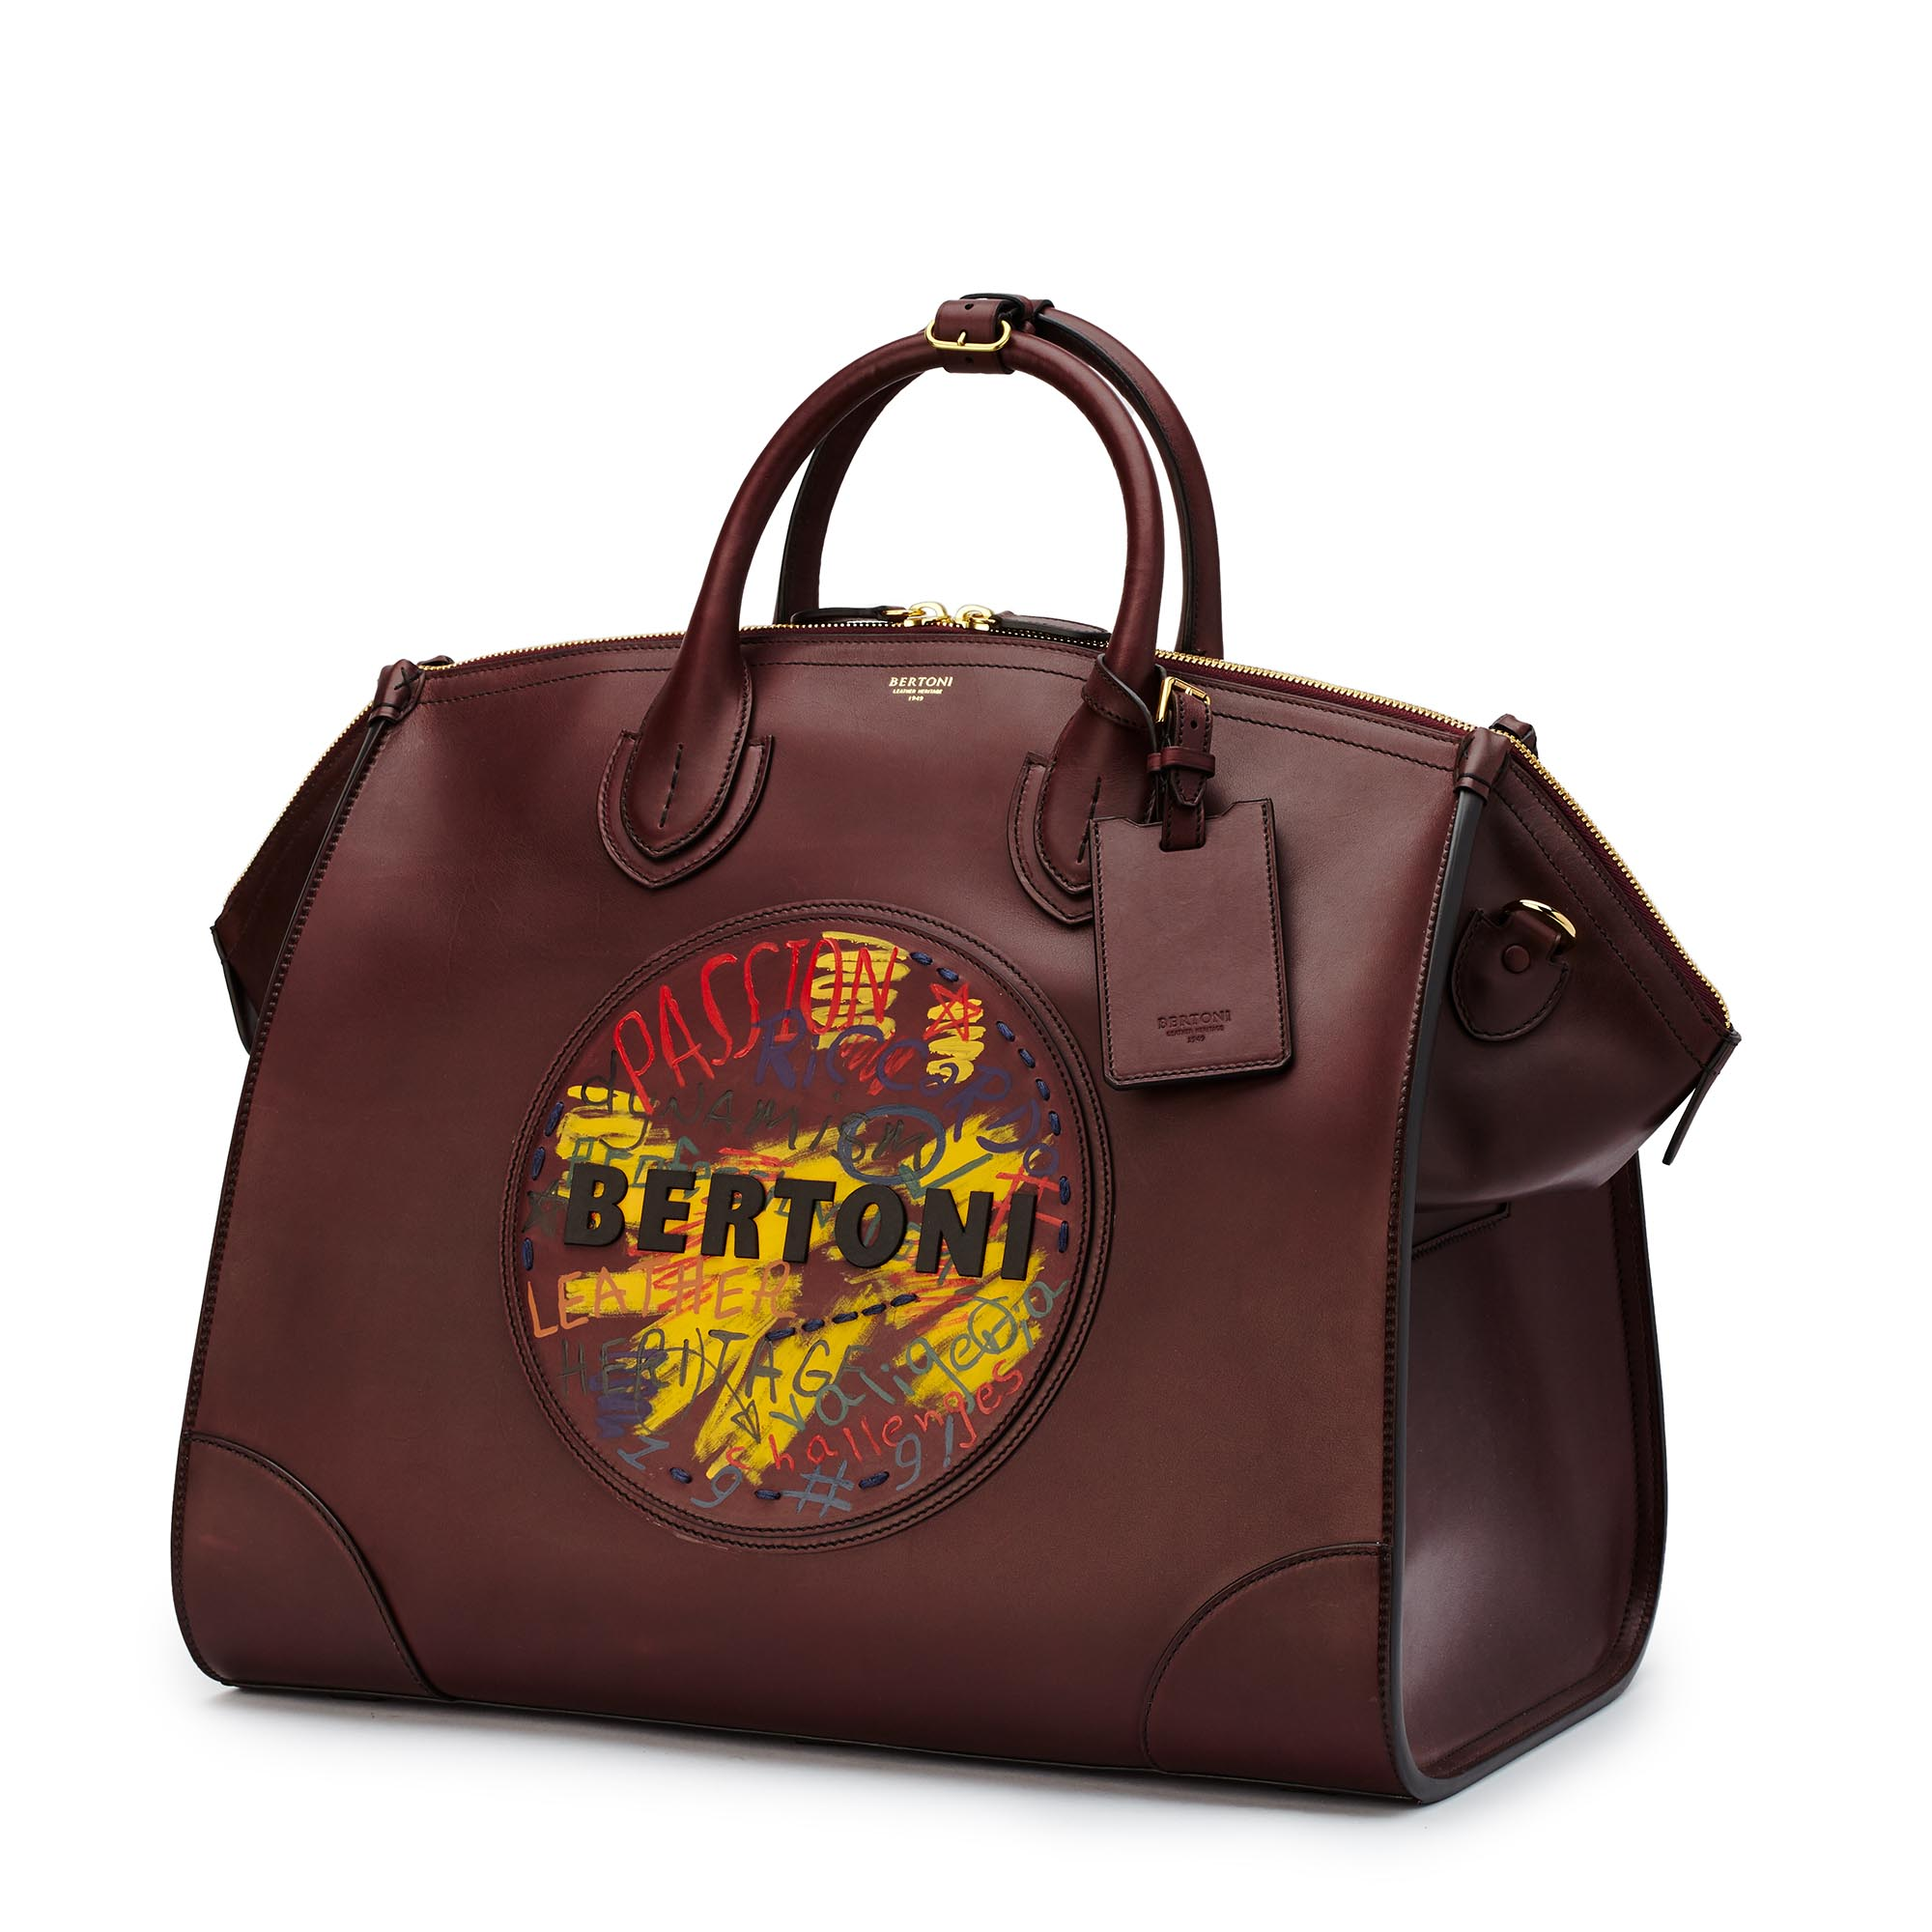 Gulliver-bordeaux-french-calf-bag-Bertoni-1949_02